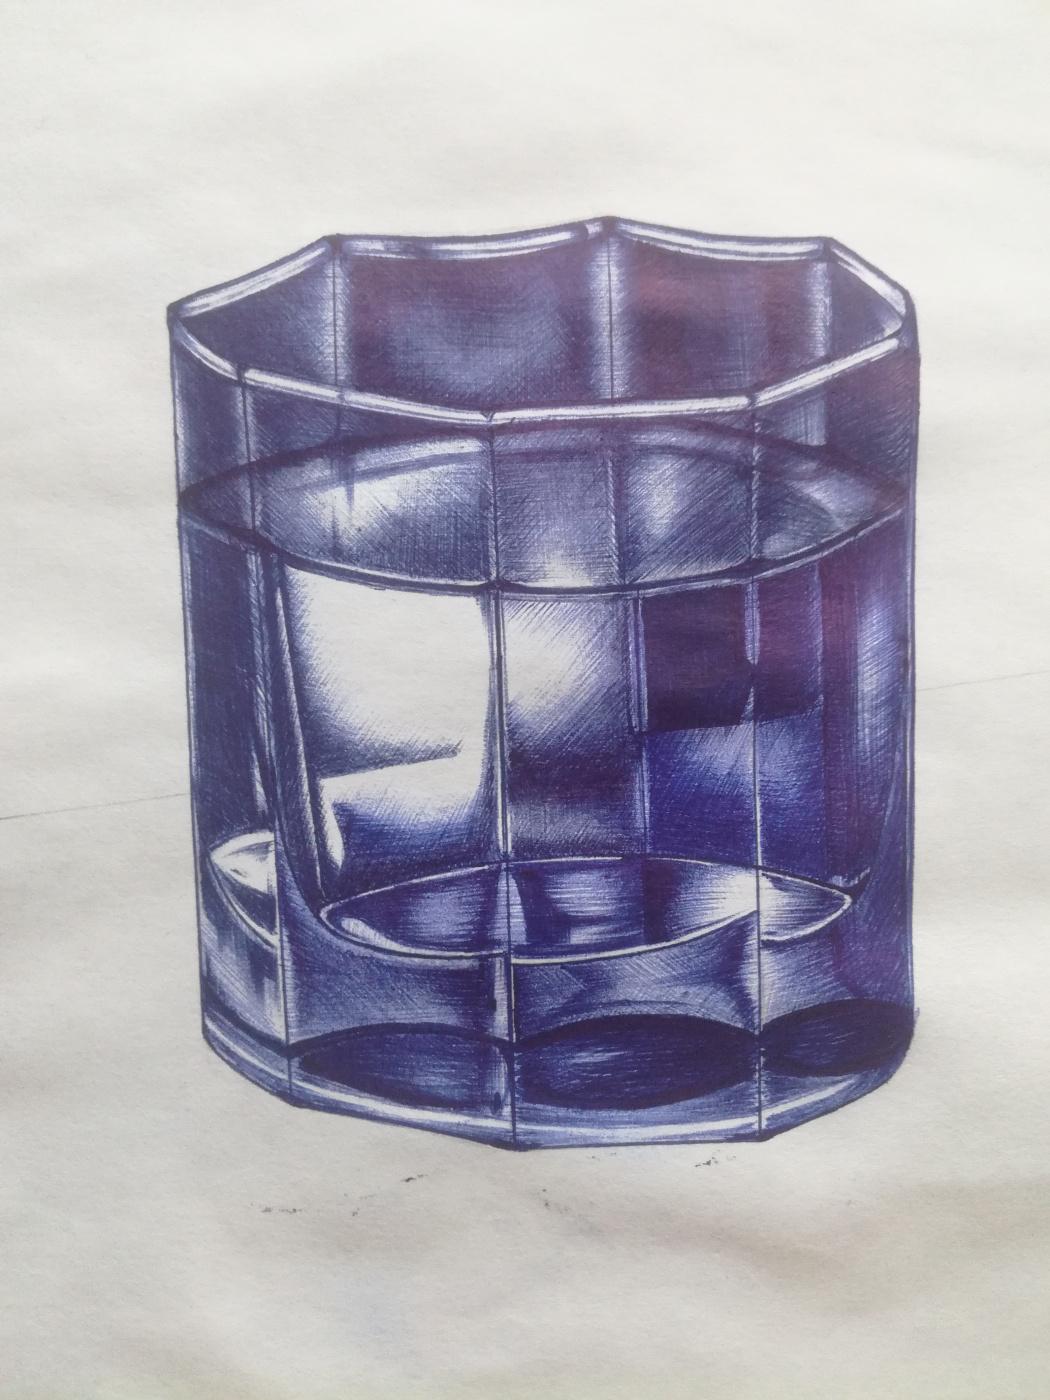 Alexey Olkhovatsky. Glass of water